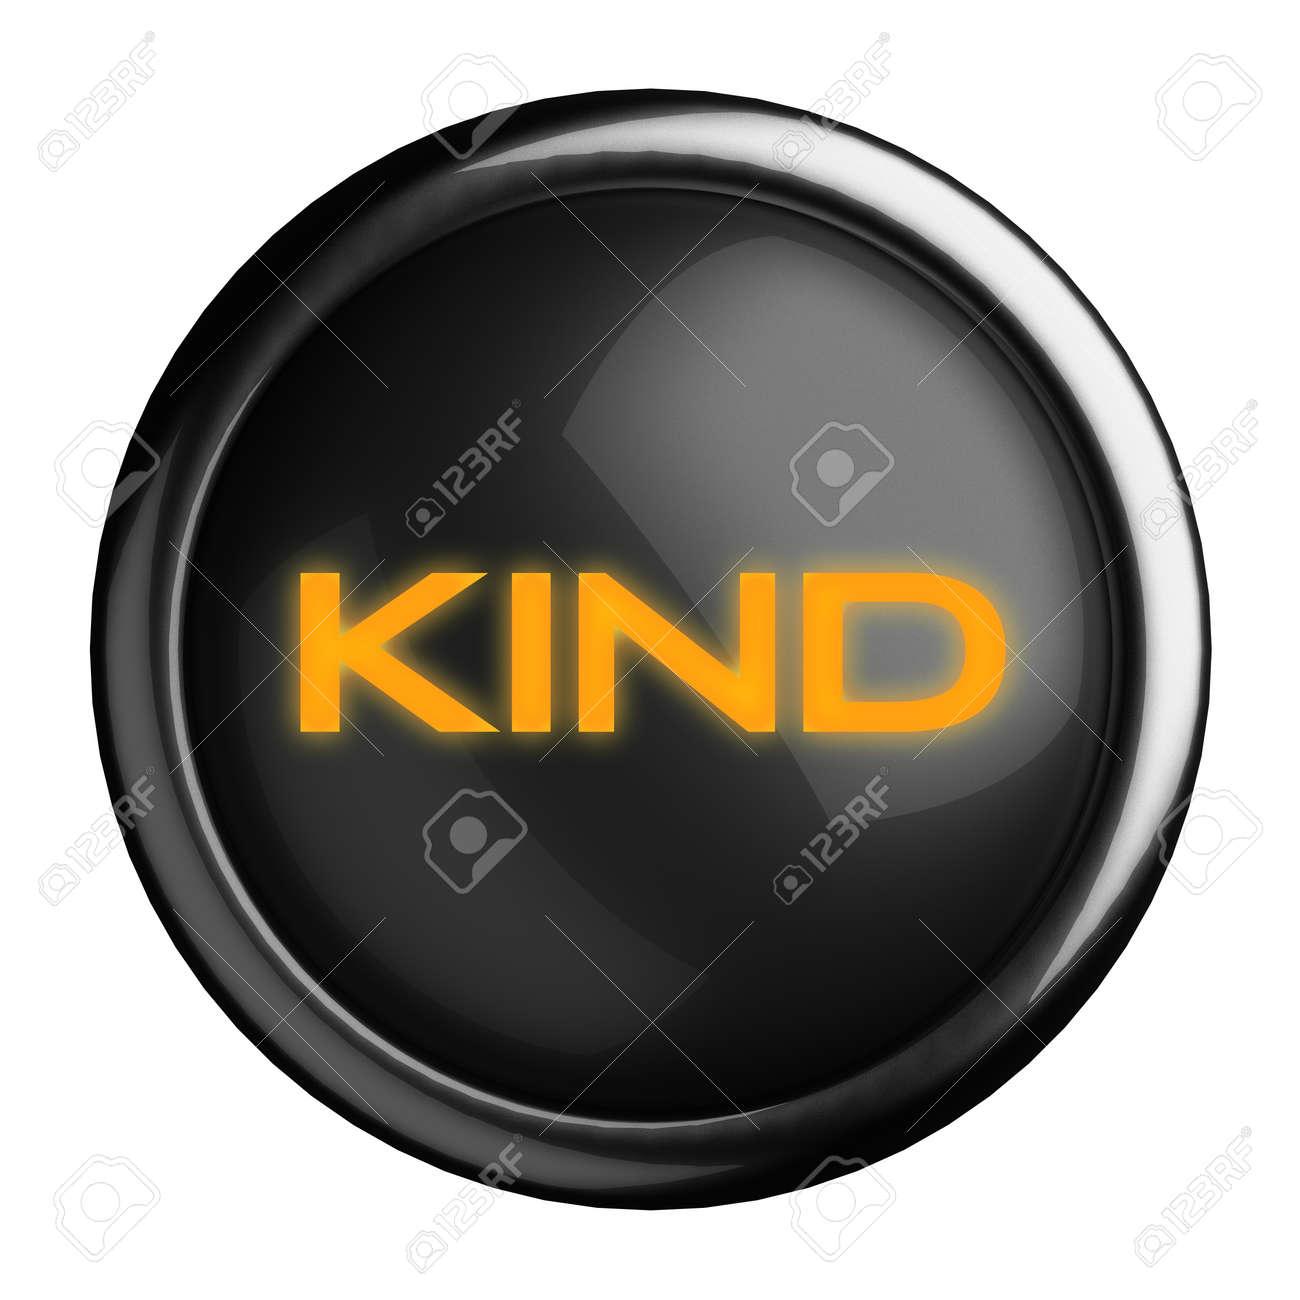 Word on black button Stock Photo - 15666511